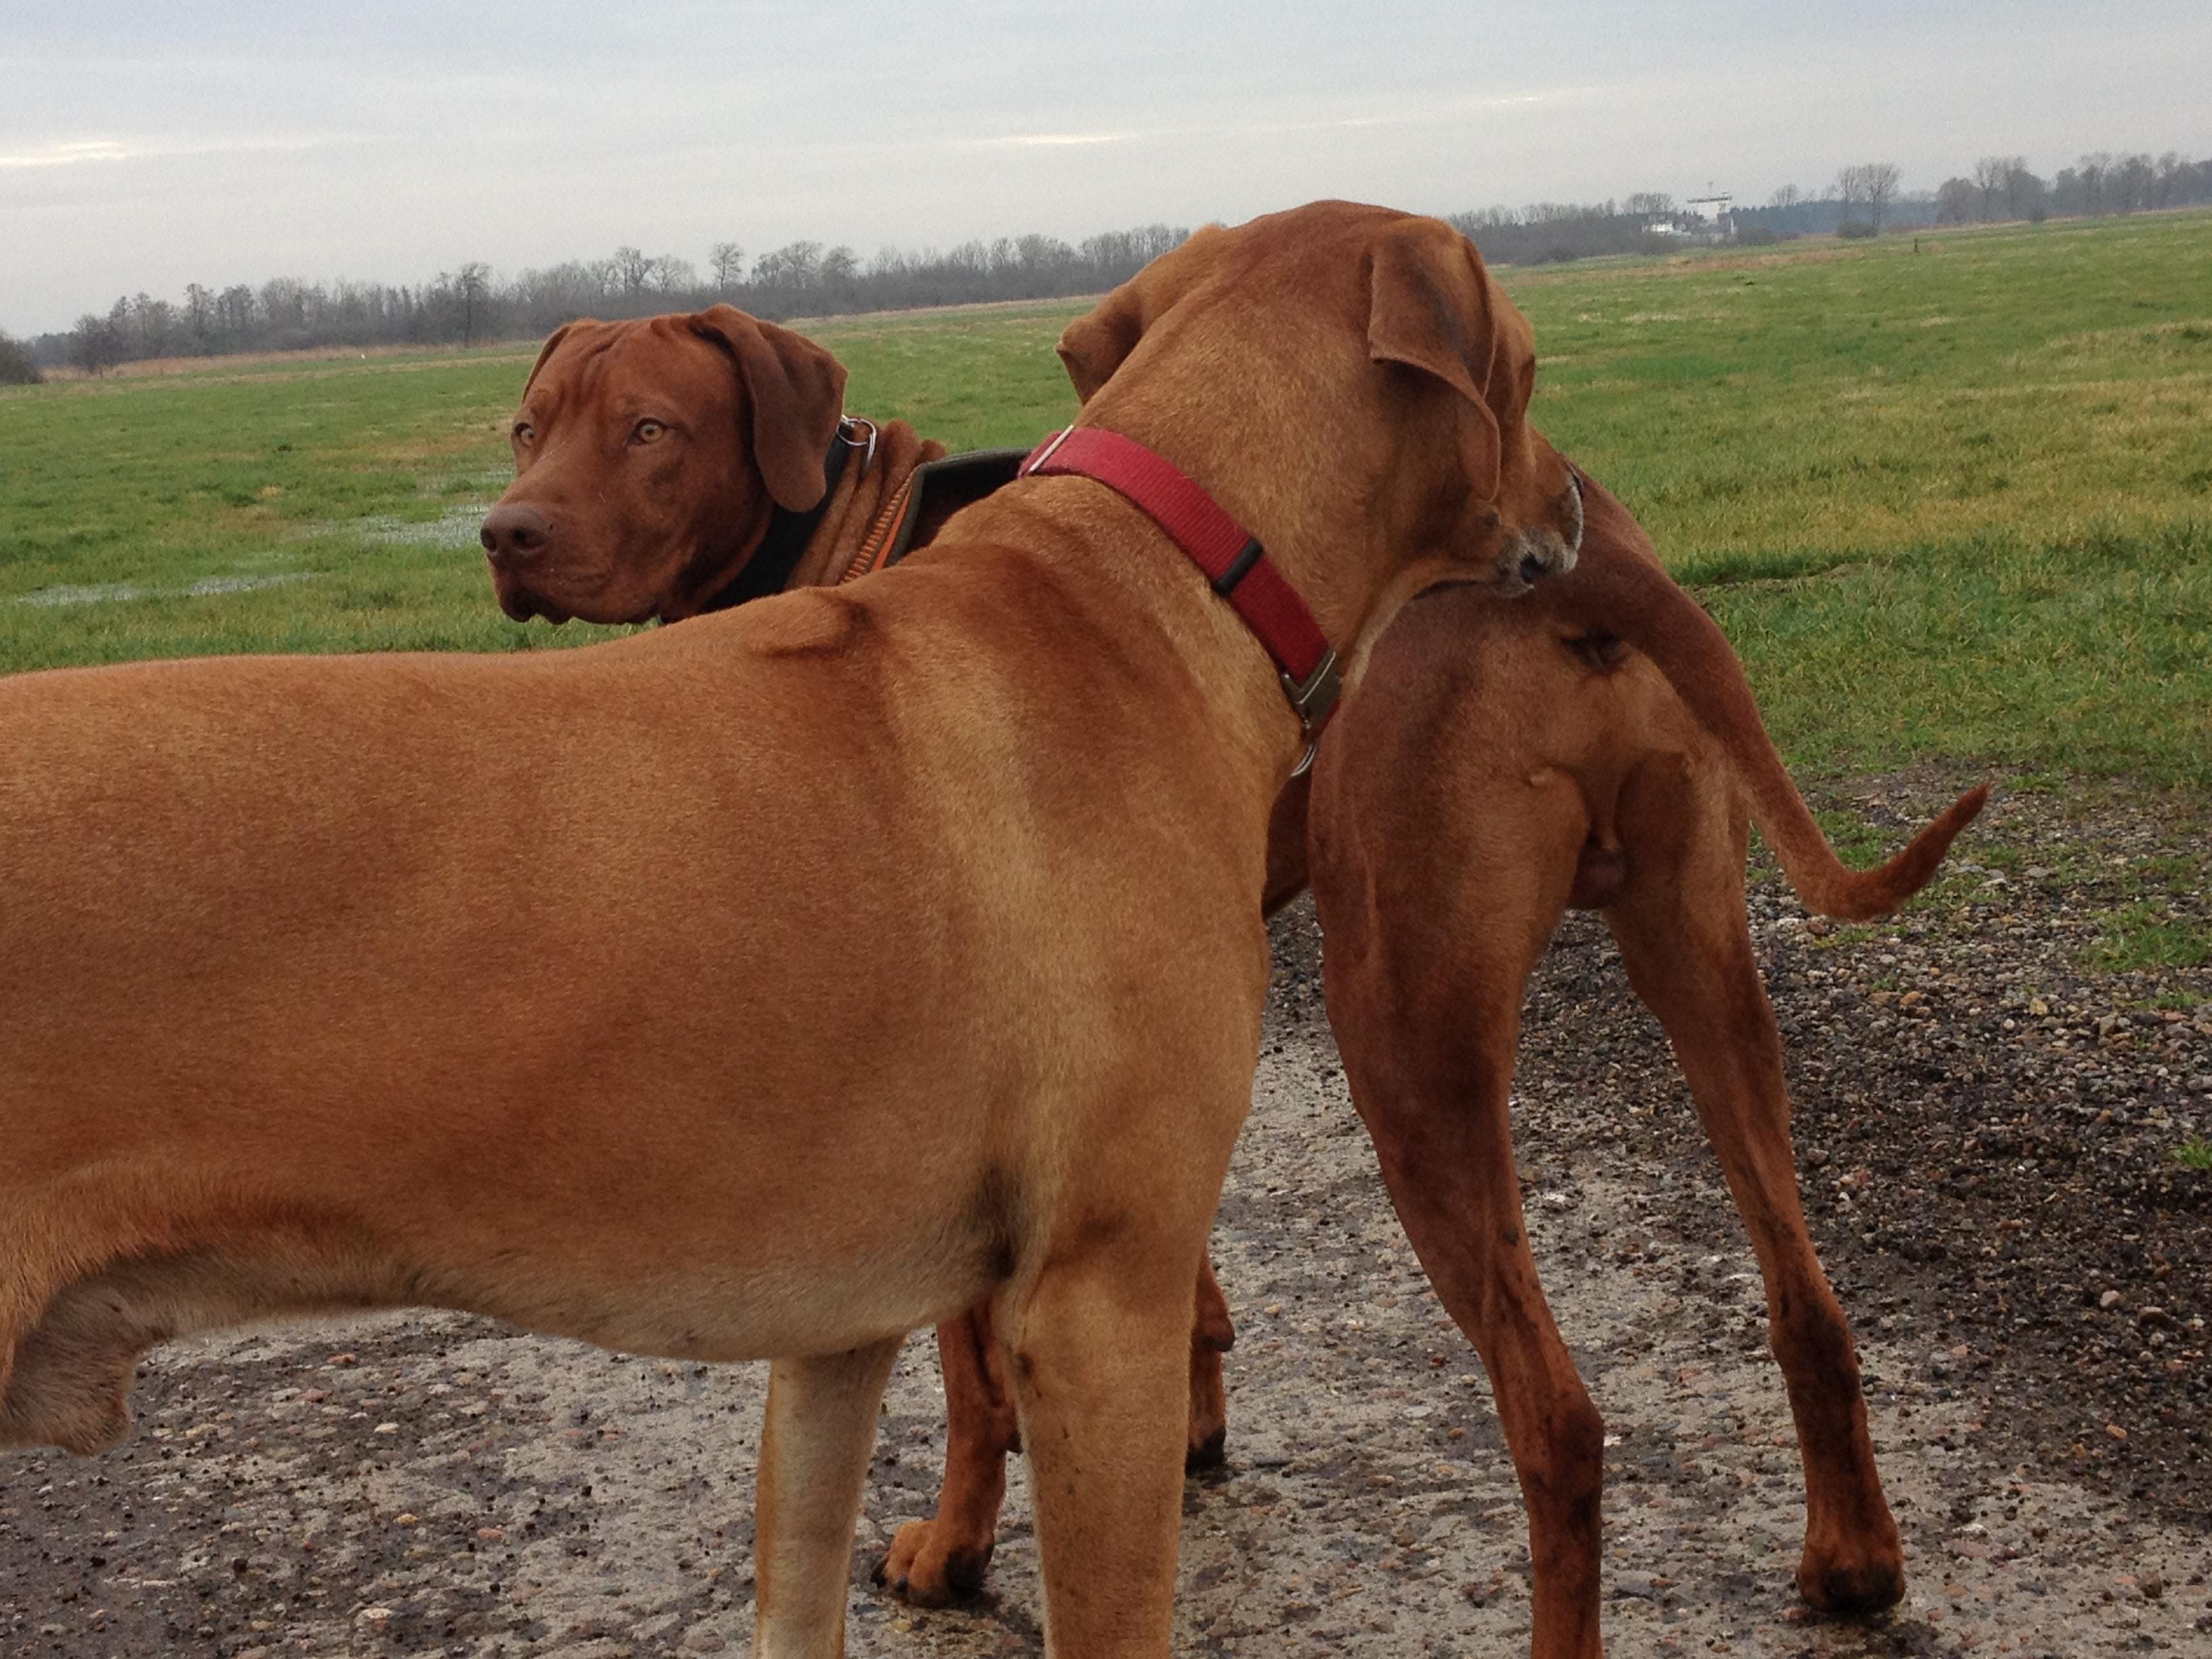 mammatumor hund einschläfern